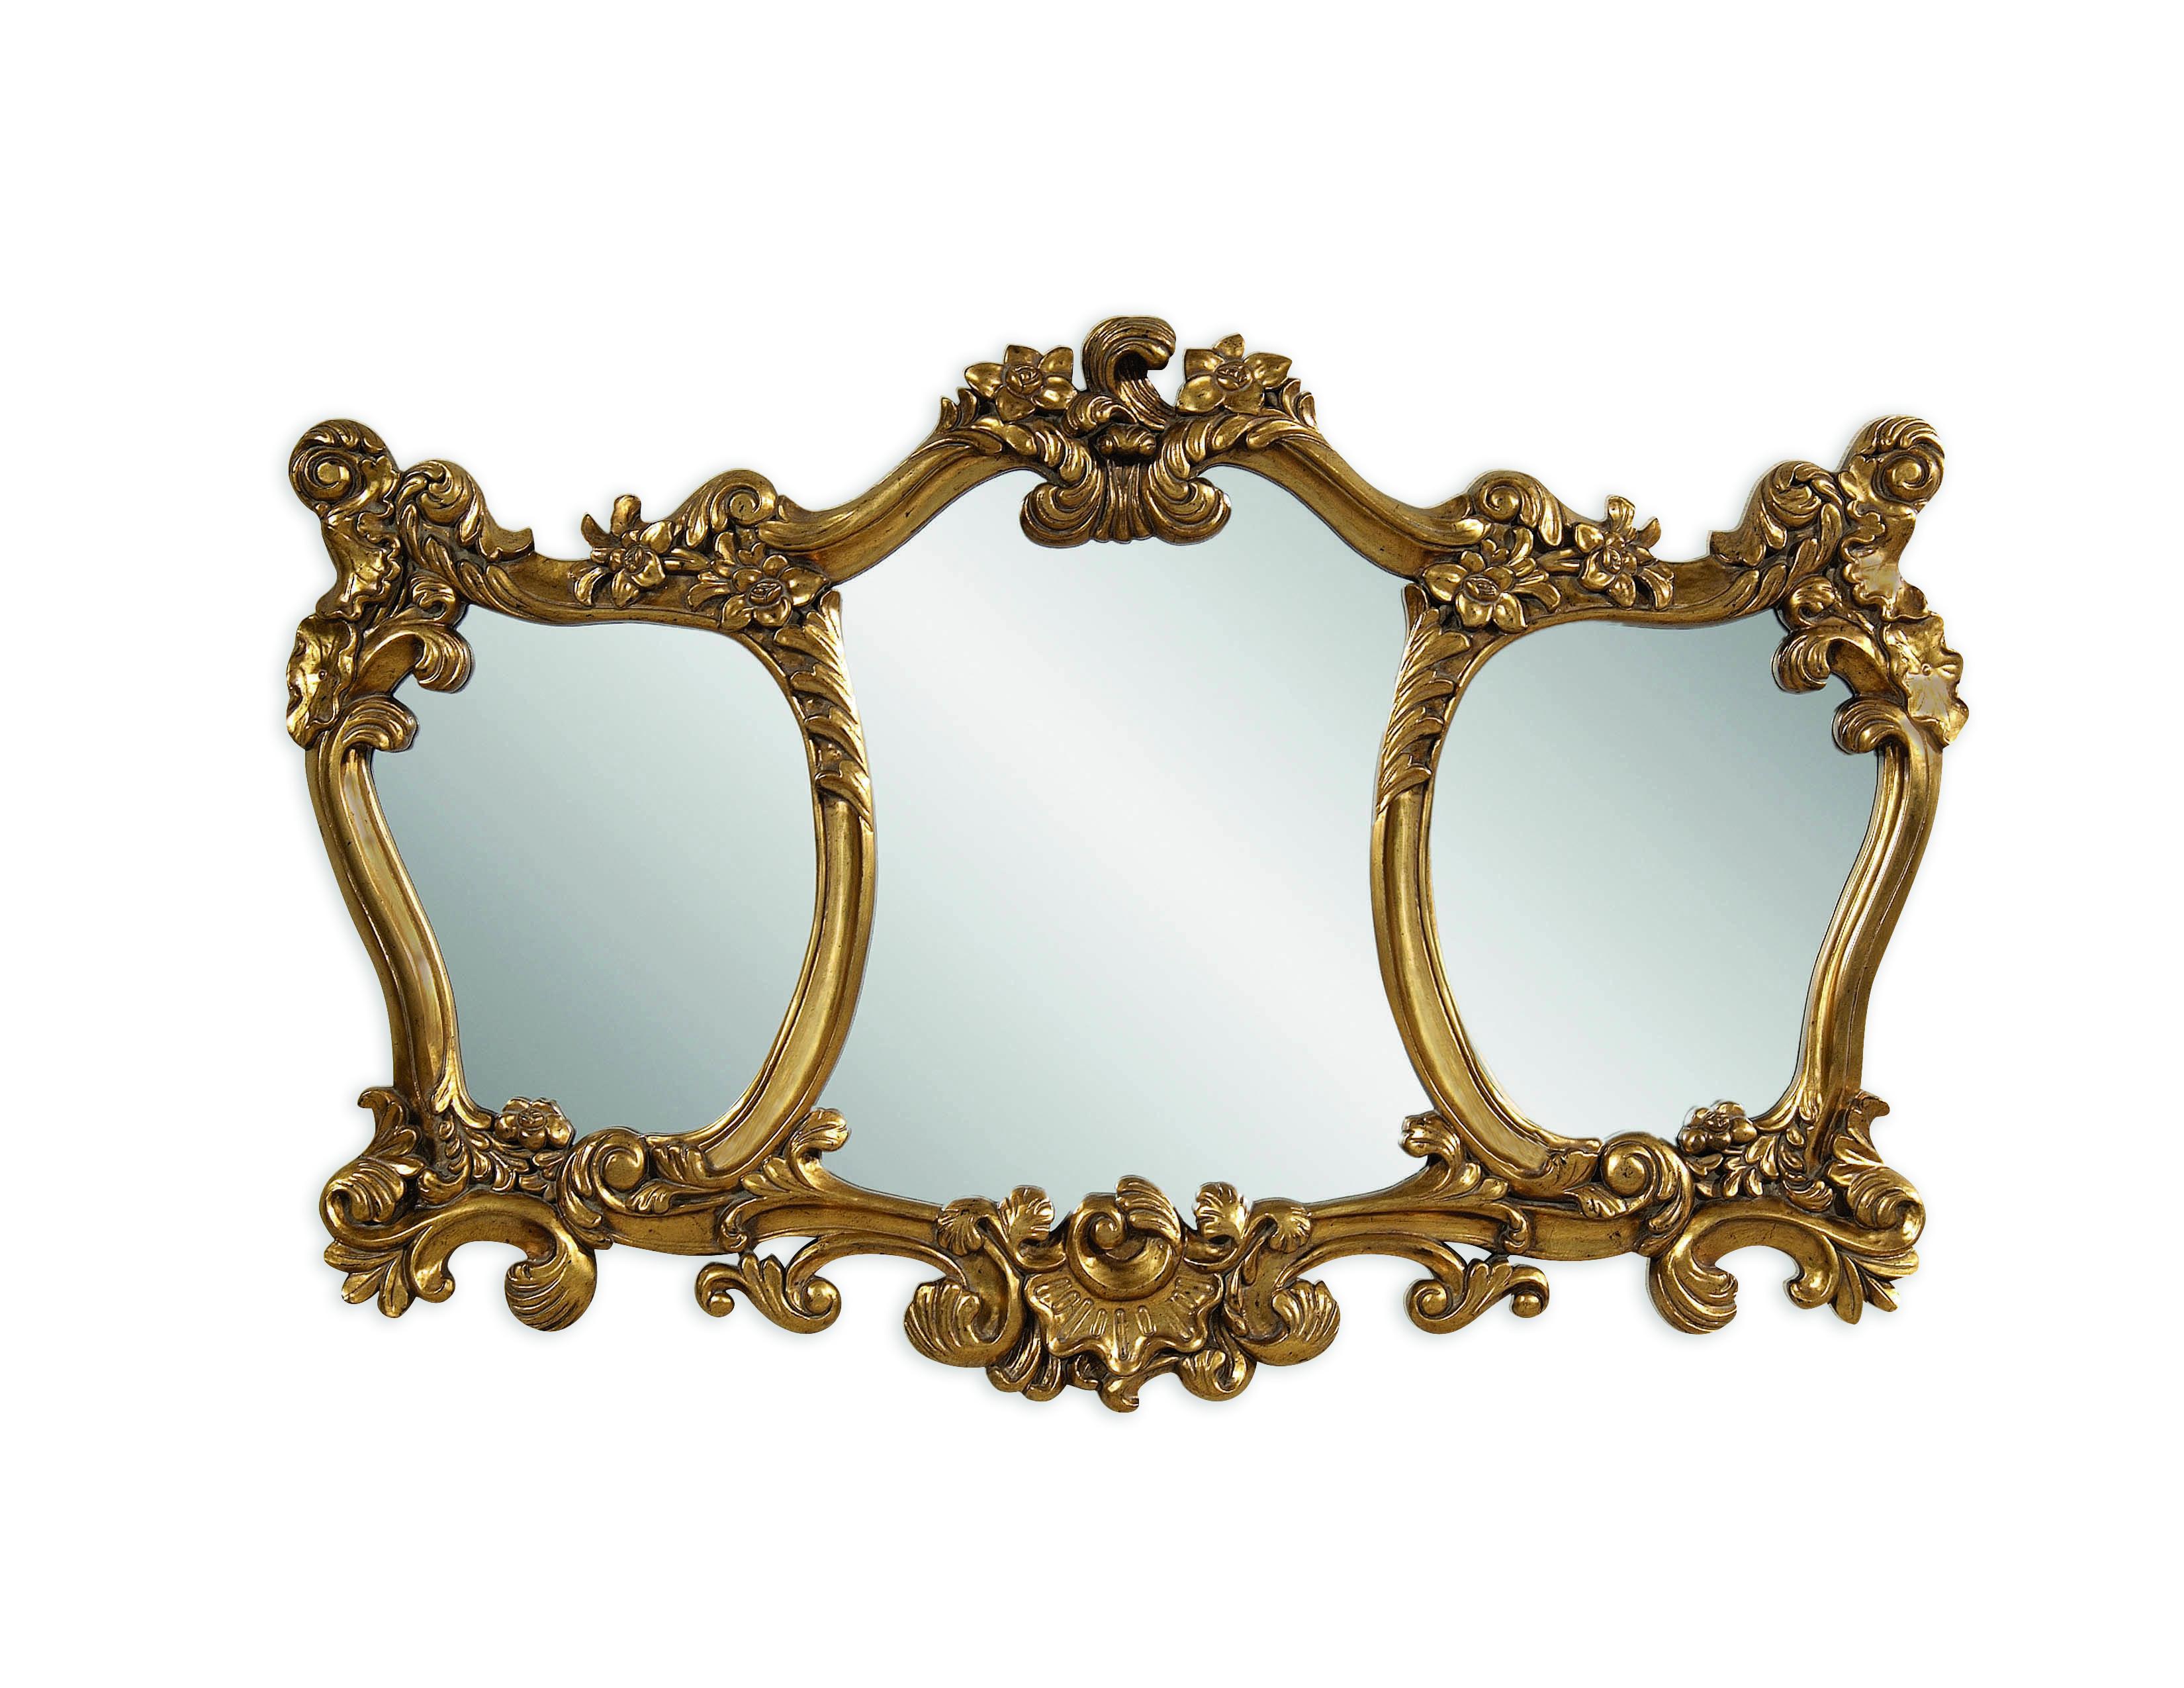 Donatella Wall Mirror